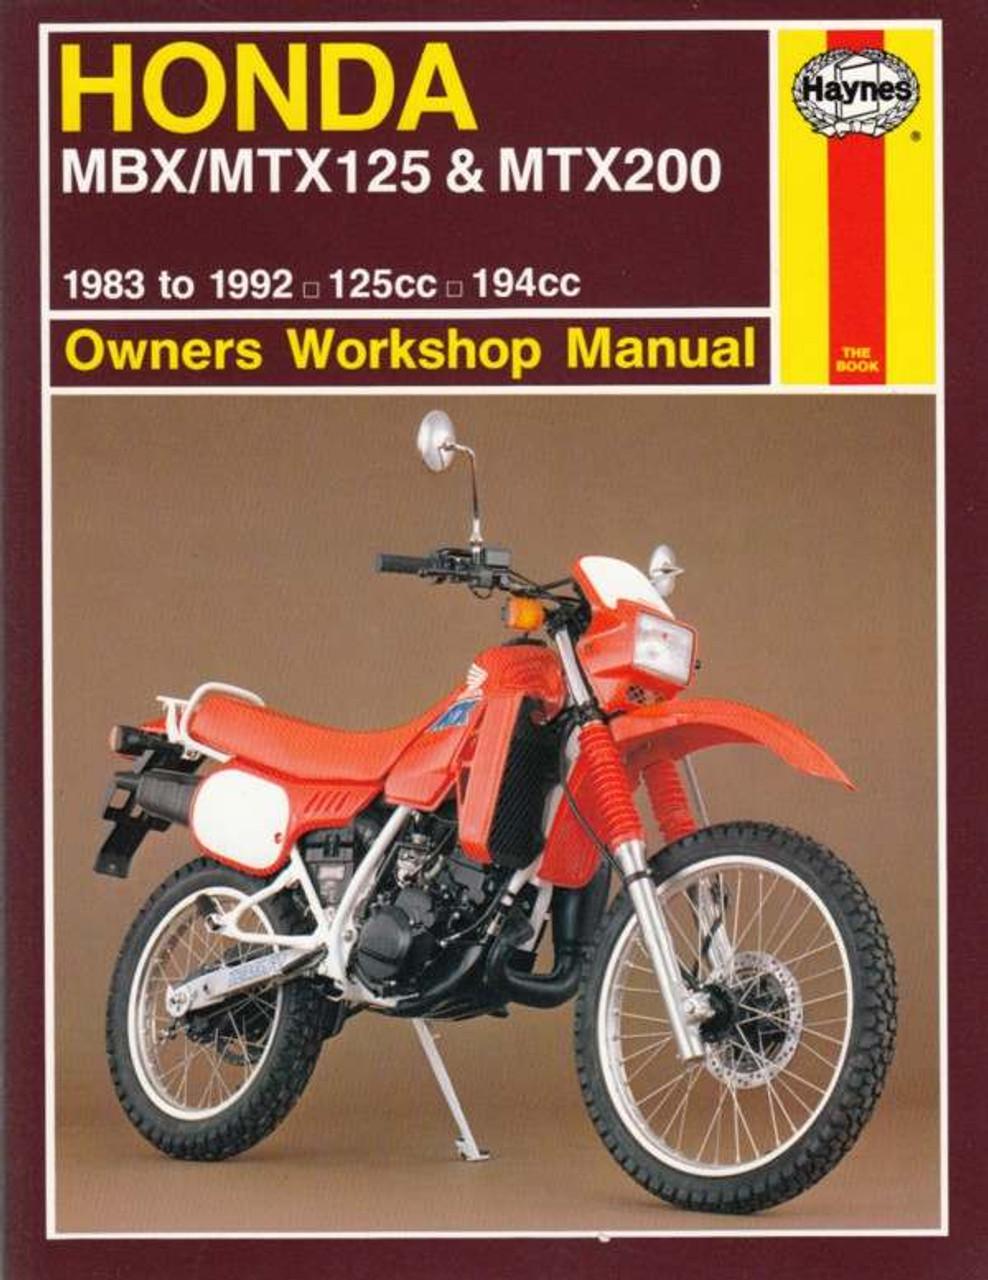 honda mbx mtx125 mtx200 125cc 194cc 1983 1992 workshop manual rh automotobookshop com au Honda 125 Dirt Bike Honda NX 125